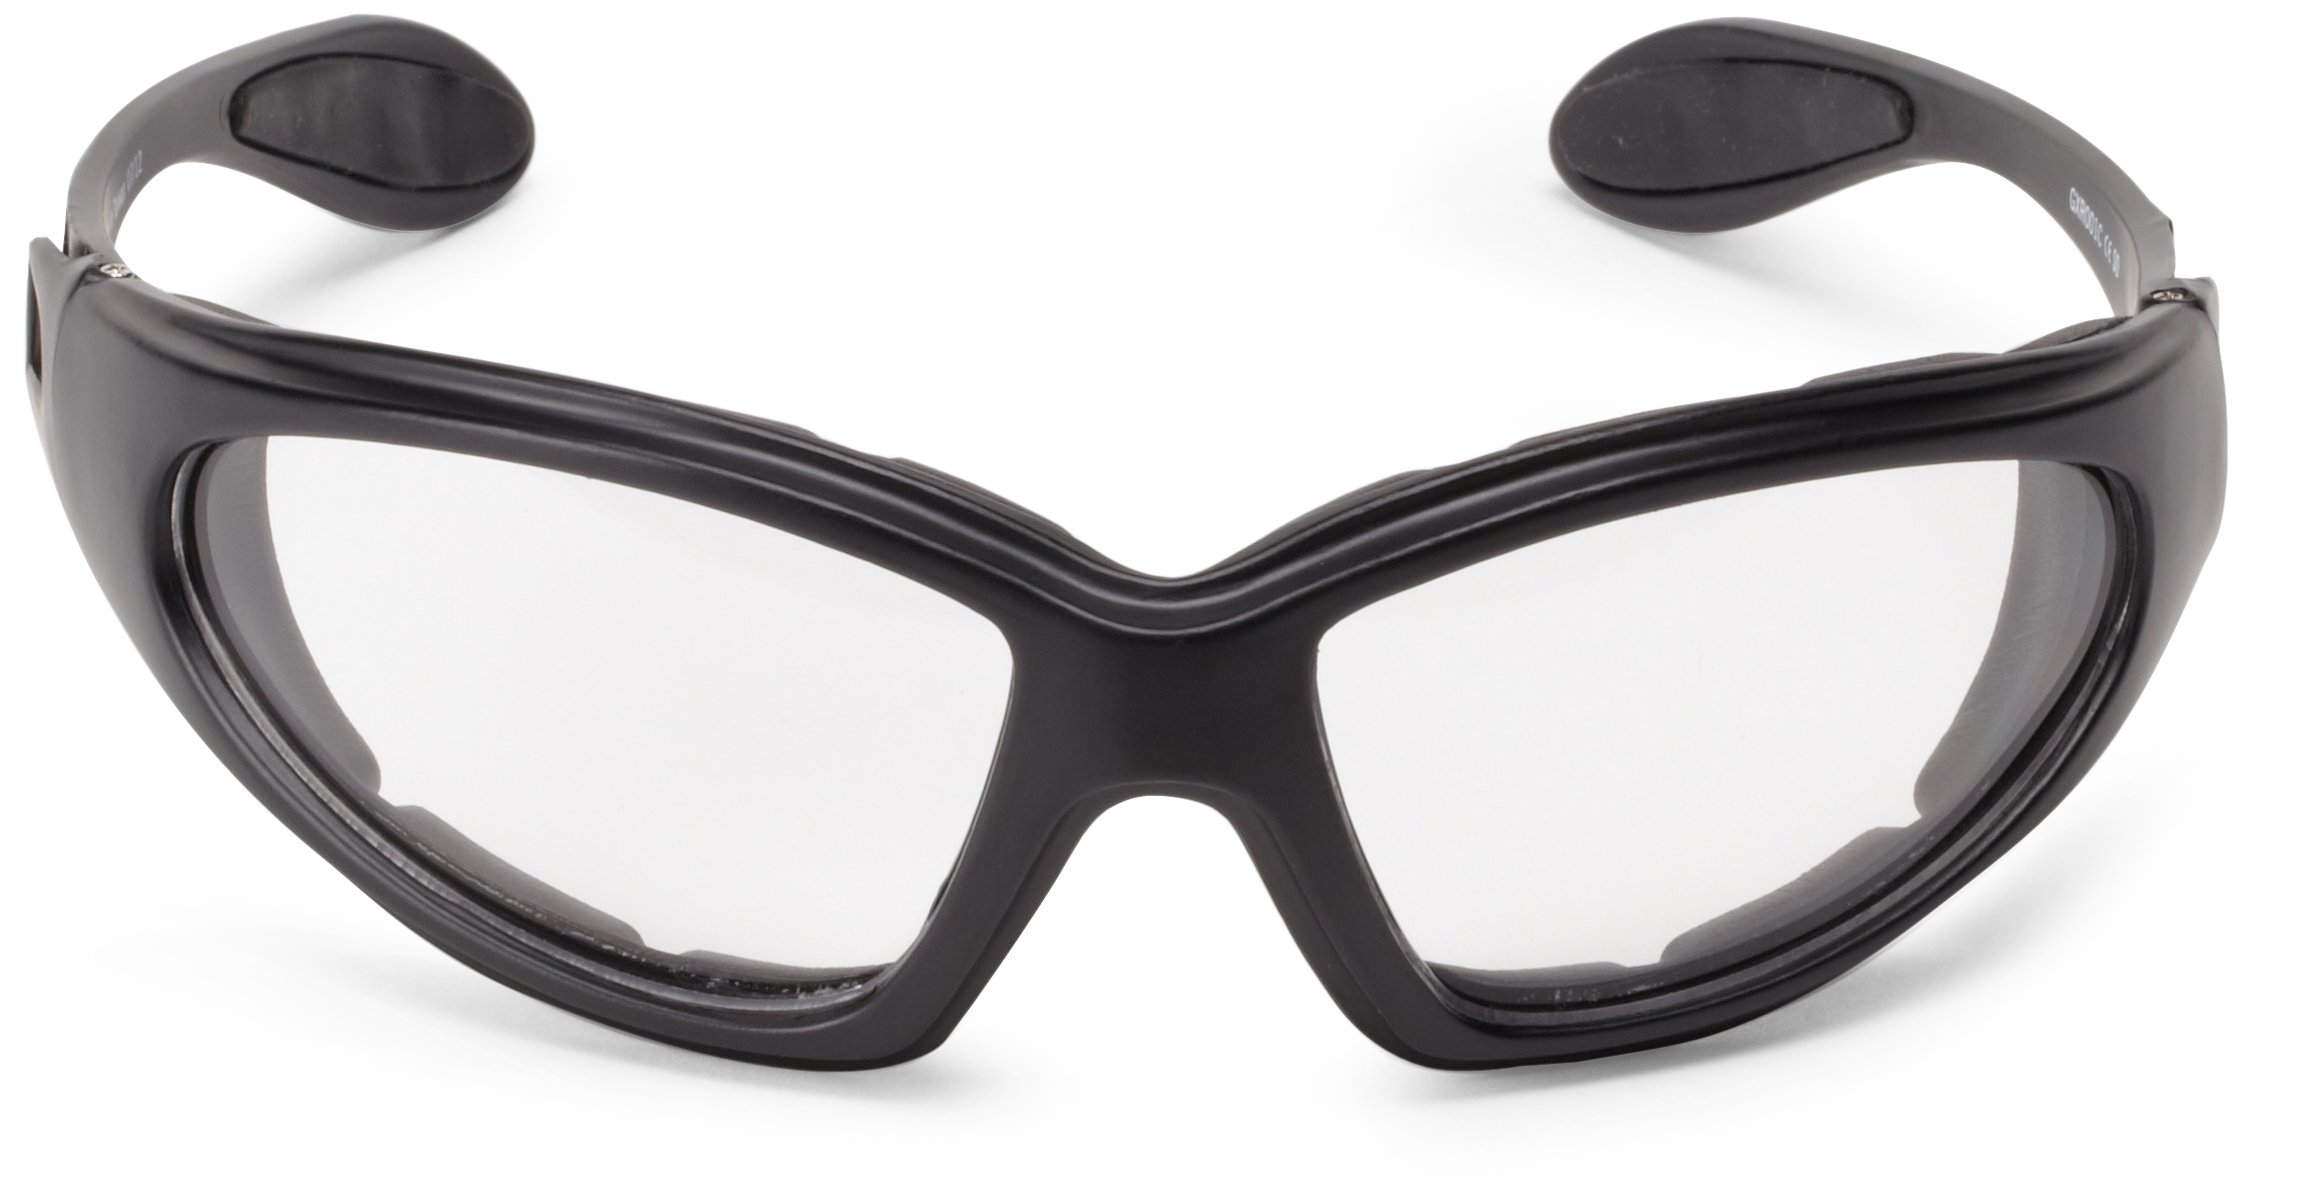 Bobster GXR Sport Sunglasses,Black Frame/Clear Lens,one size by Bobster (Image #3)